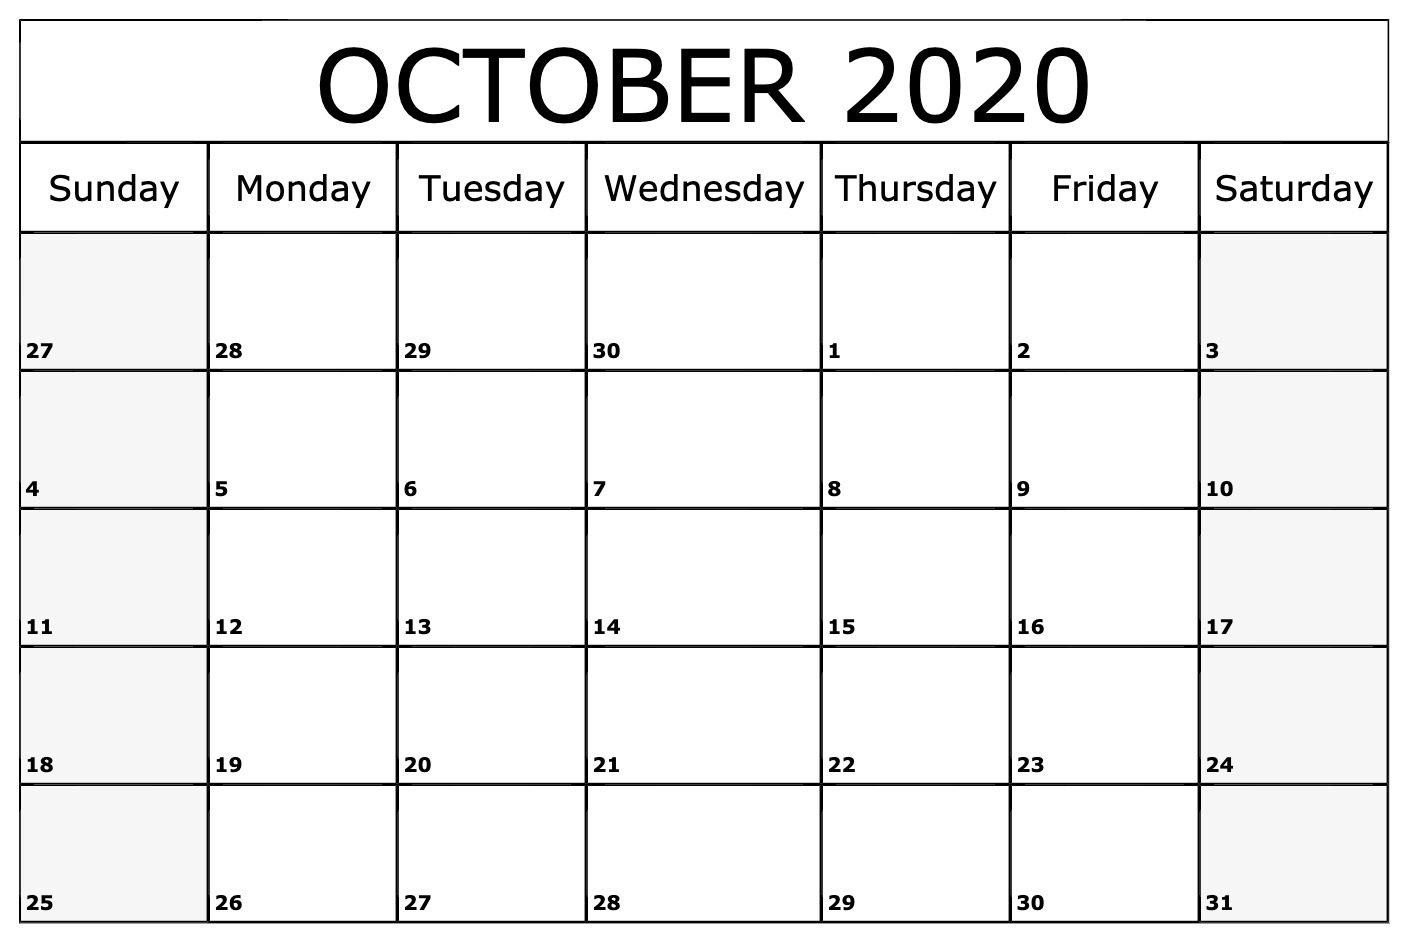 October 2020 Calendar Printable Blank Template